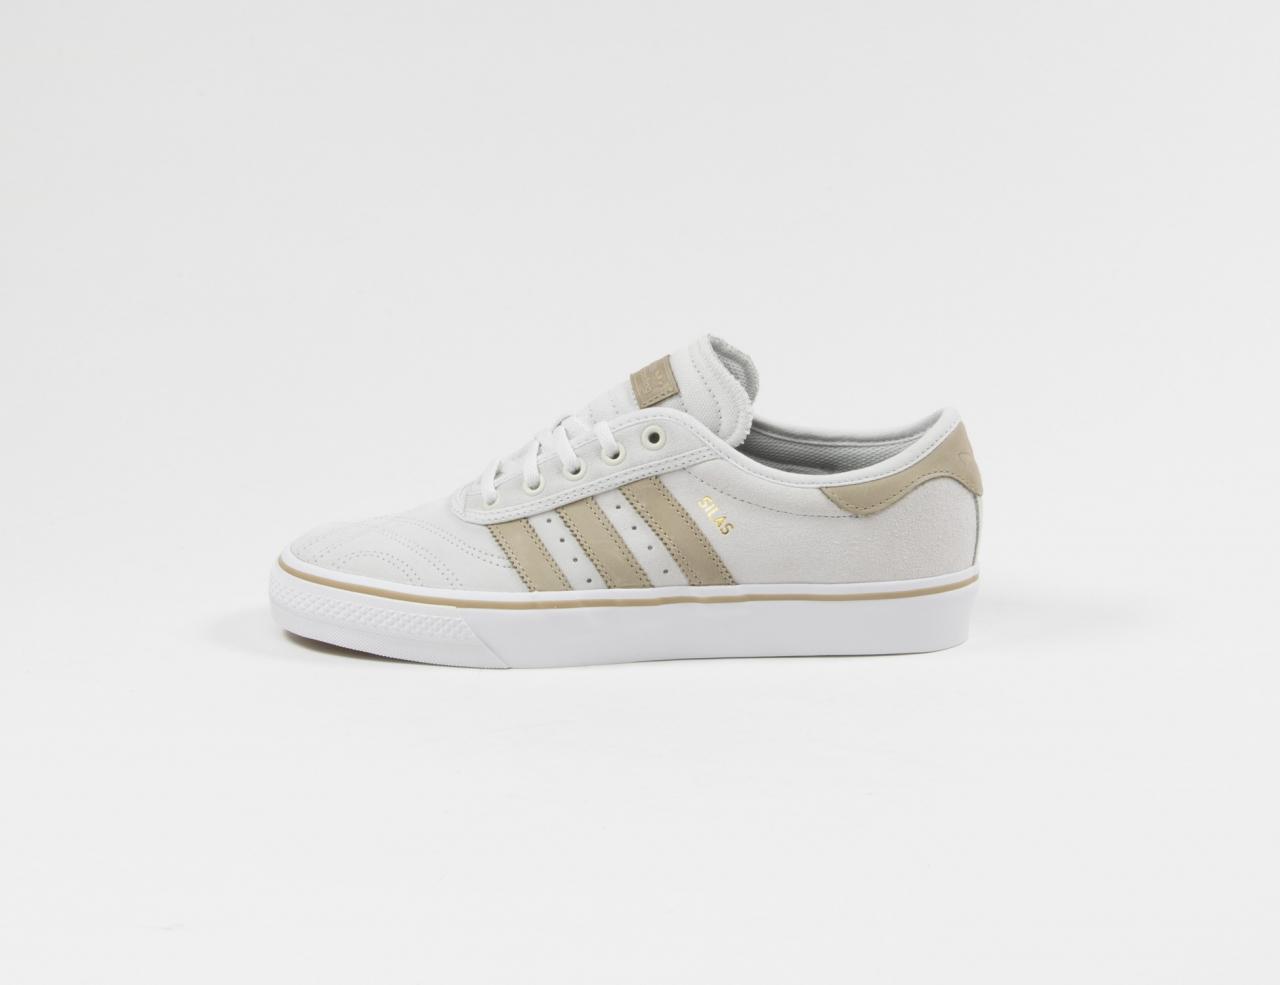 Adidas Adidas Adi-Ease Premiere Schuh